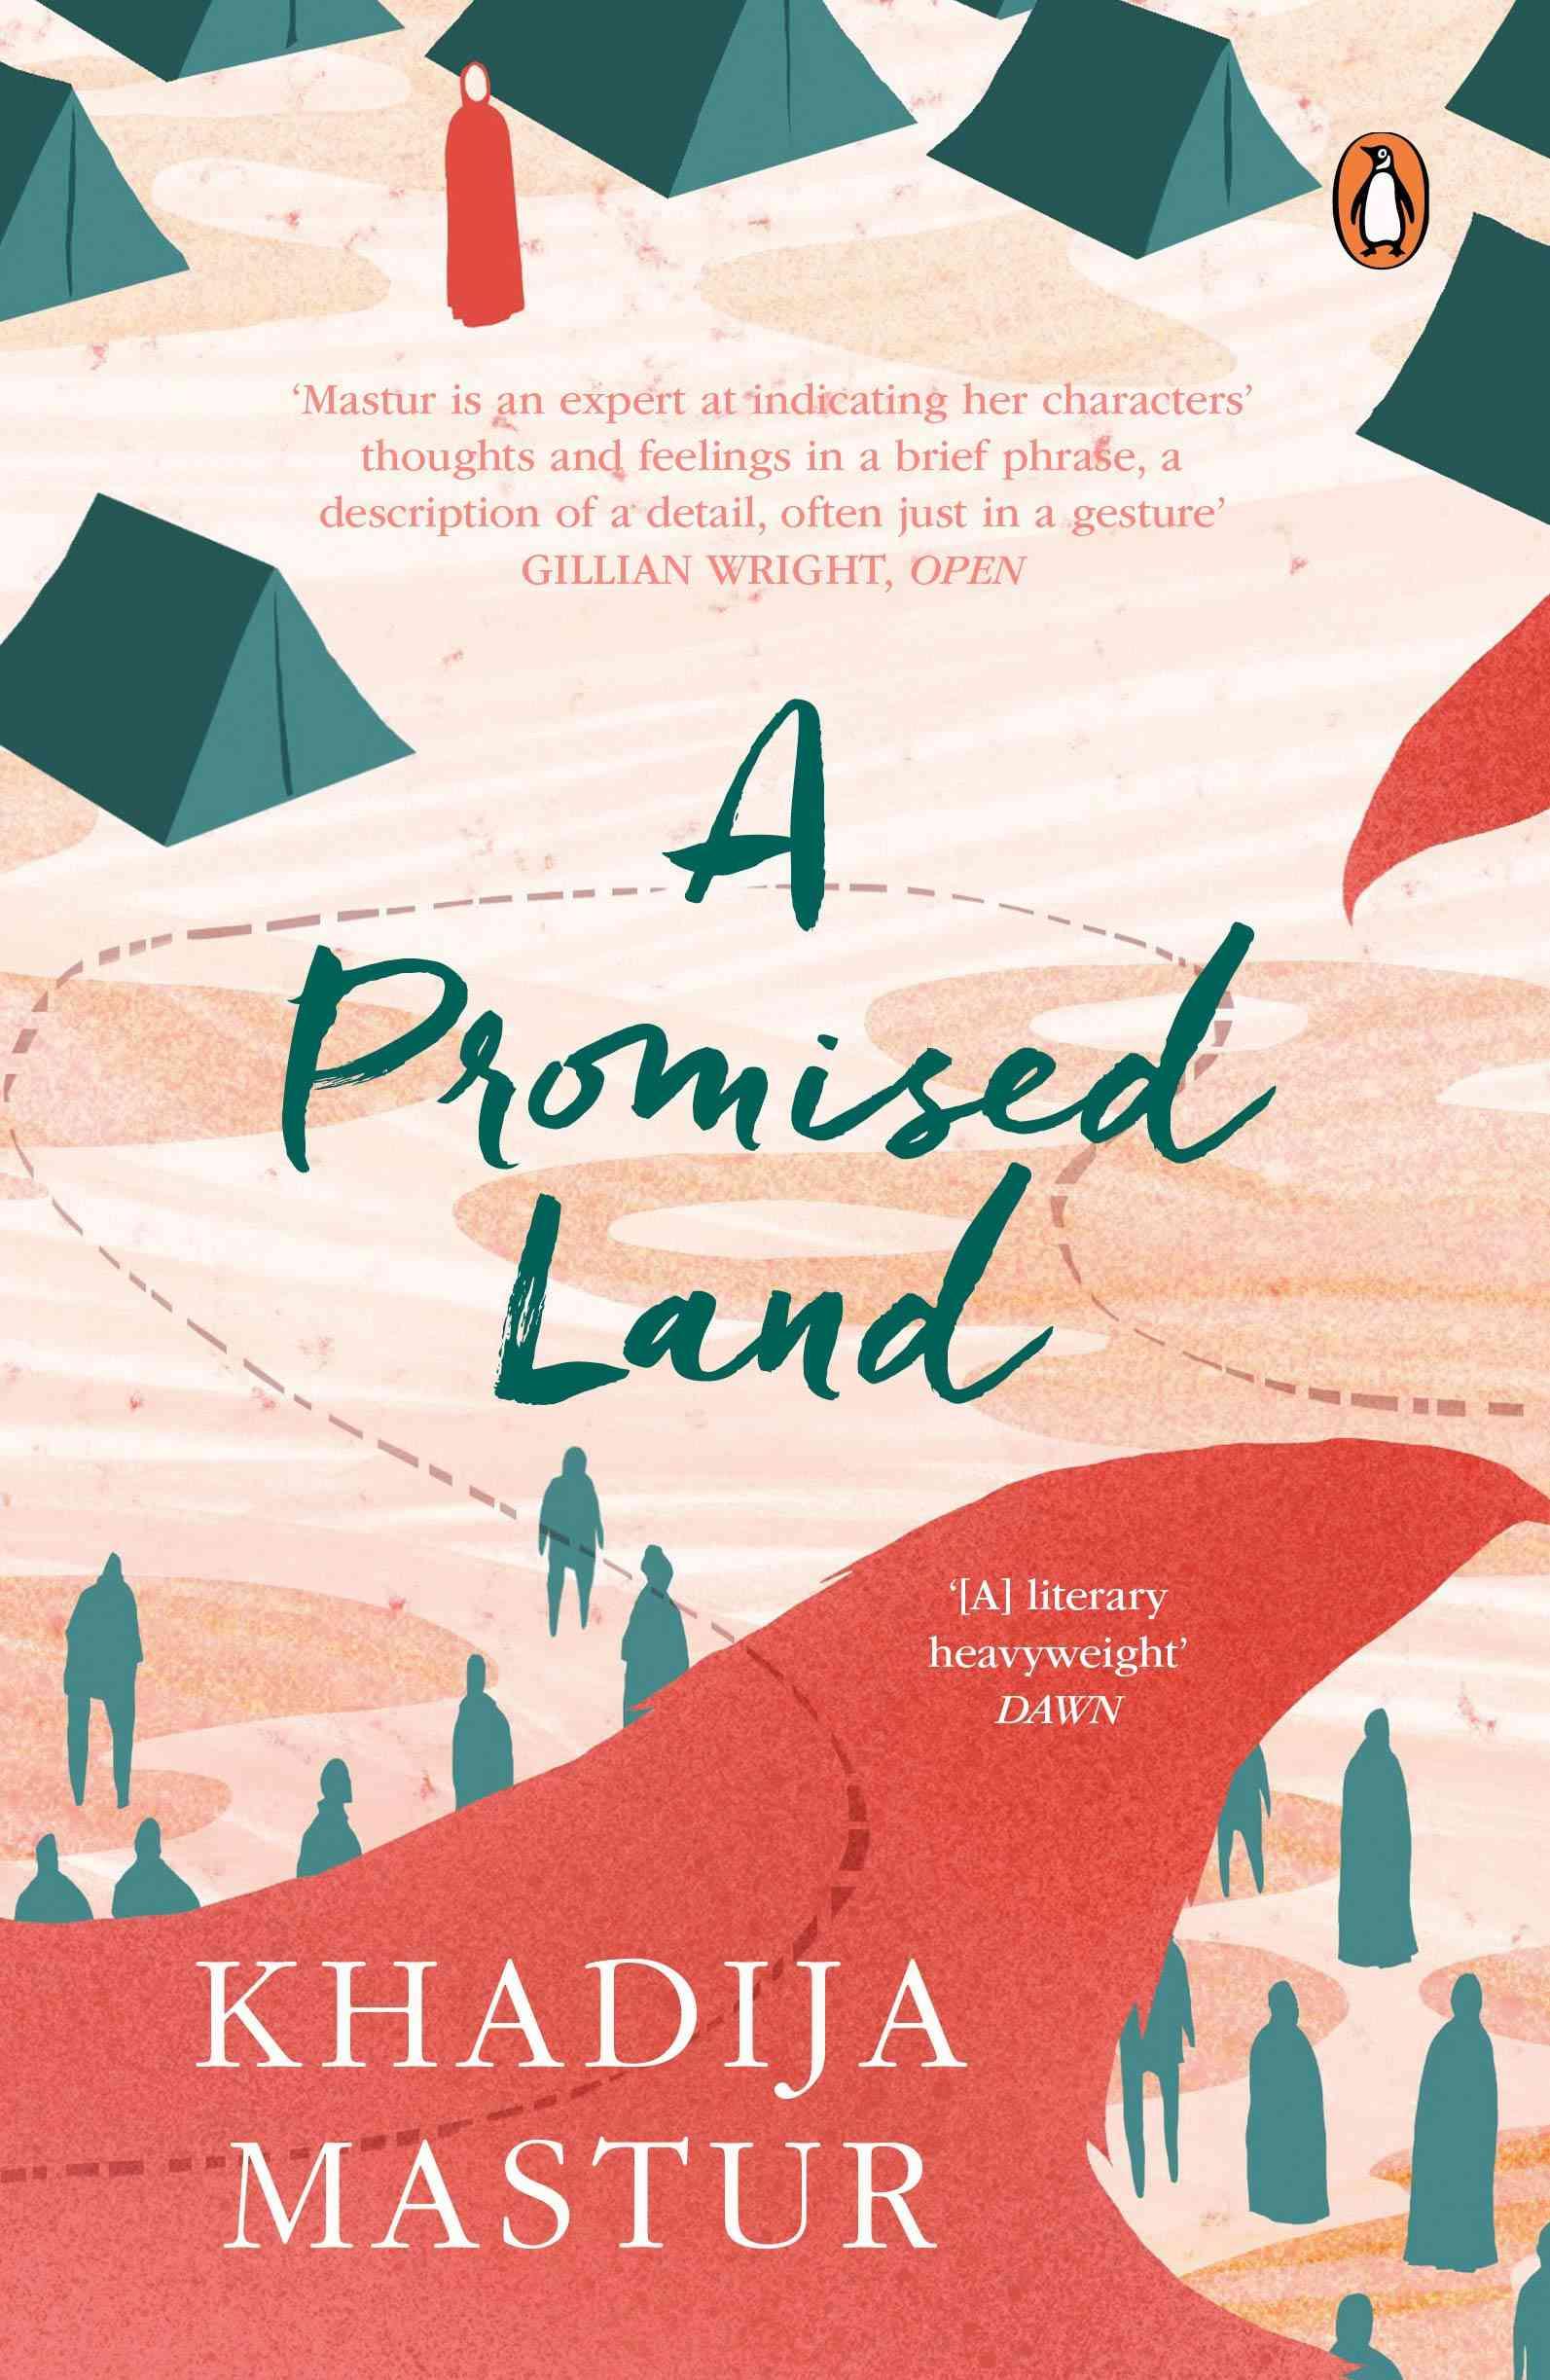 Daisy Rockwell's reinvents Khadija Mastur's Urdu novel